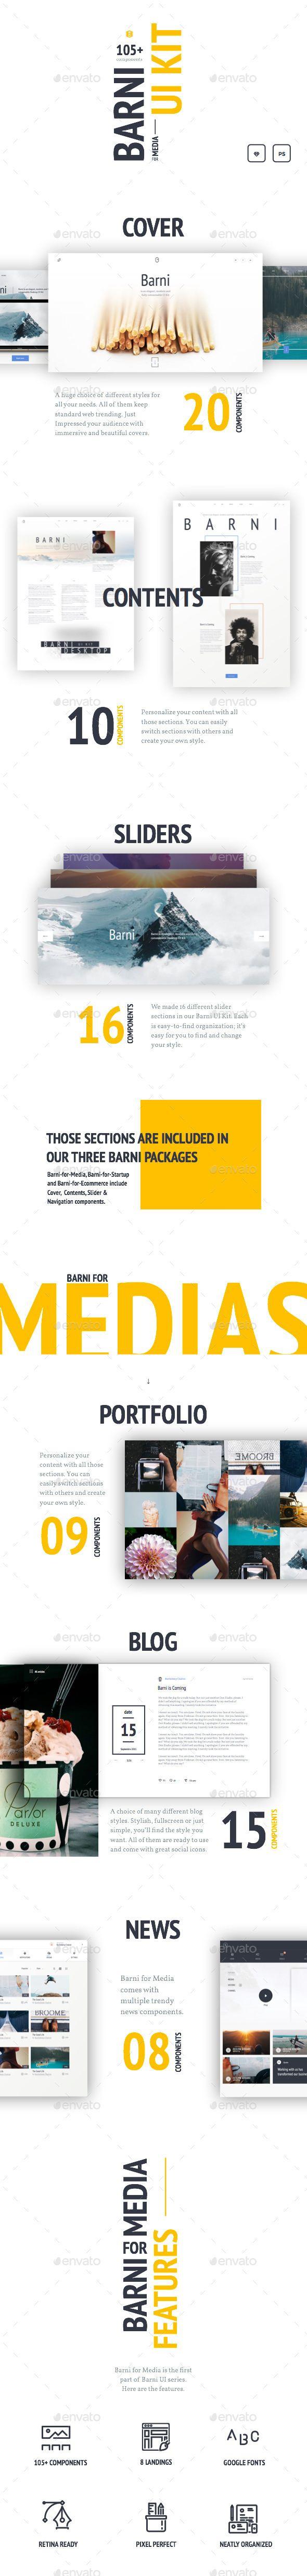 Barni for Media UI Kit